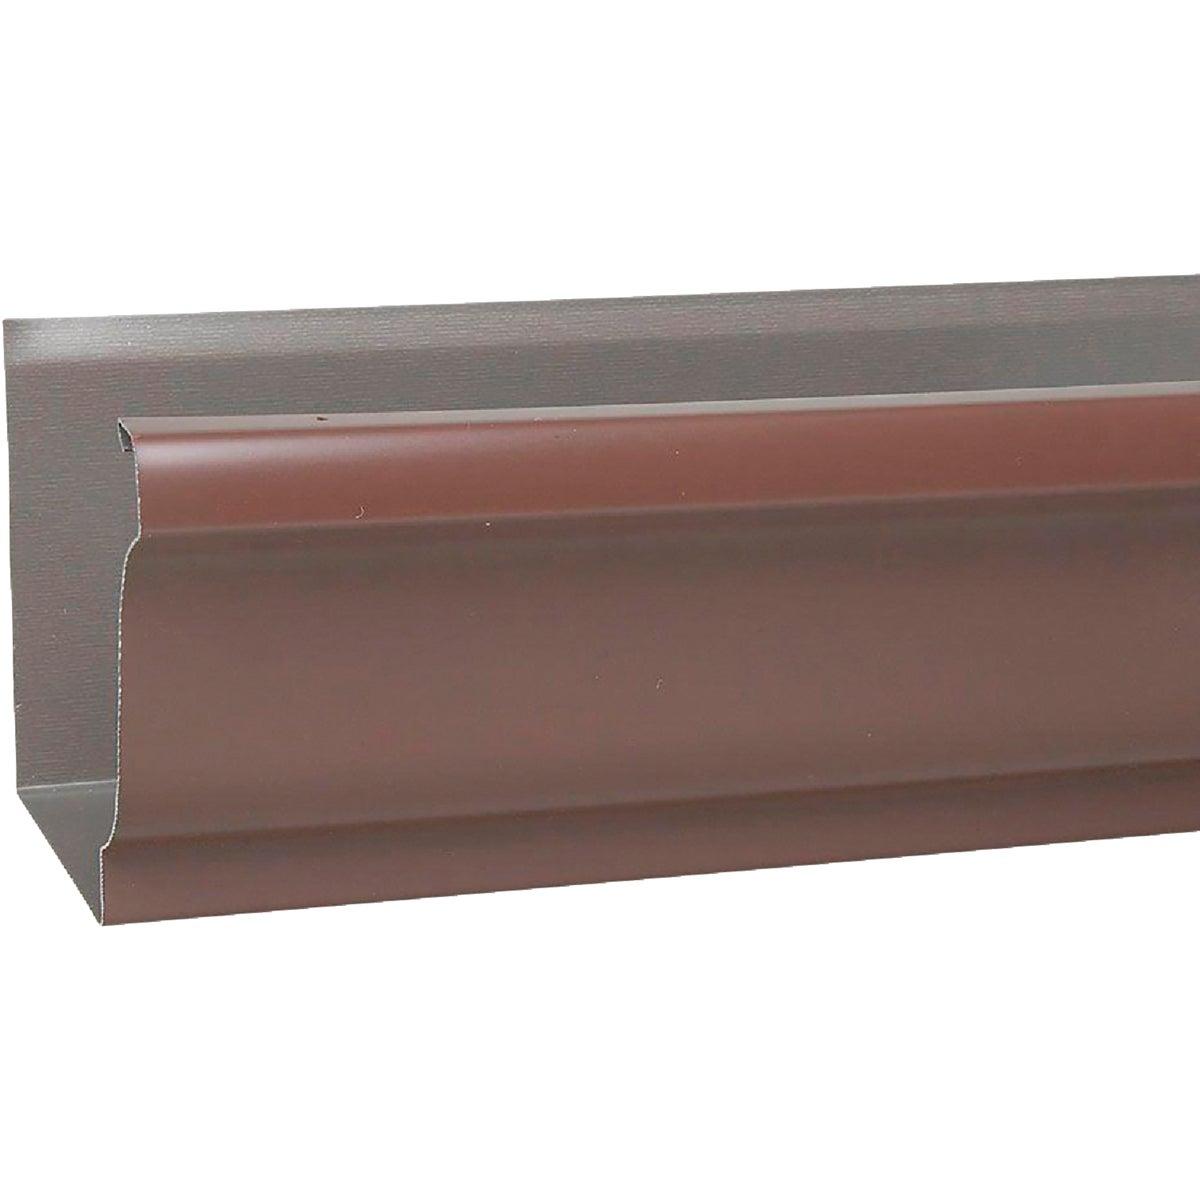 "5"" BRN STANDARD GUTTER - 2400219120 by Amerimax Home Prod"